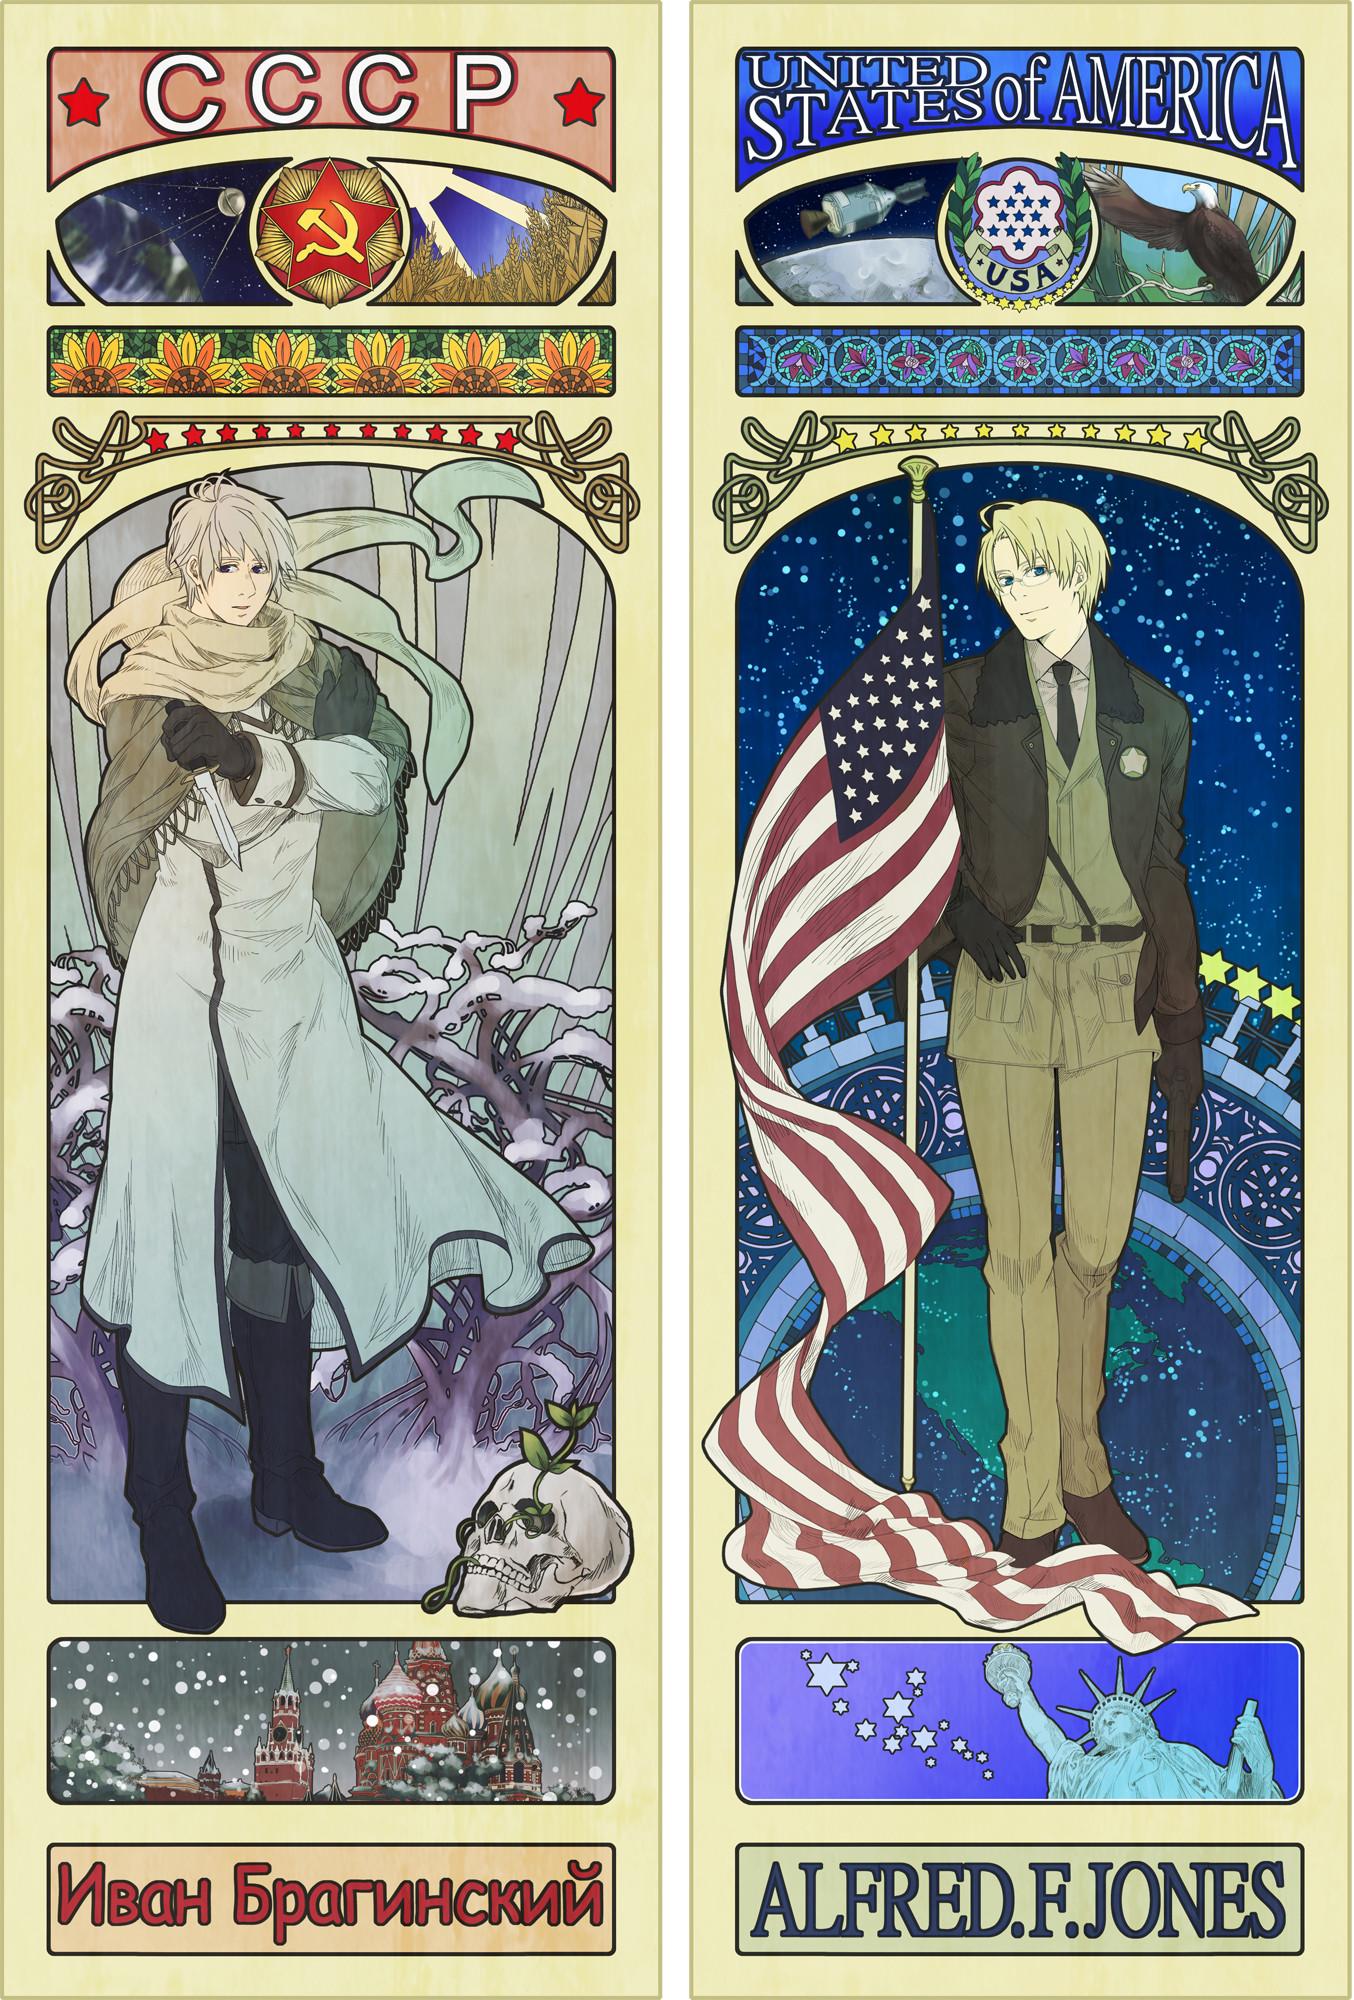 Mucha-inspired America & Russia Posters for Hetalia